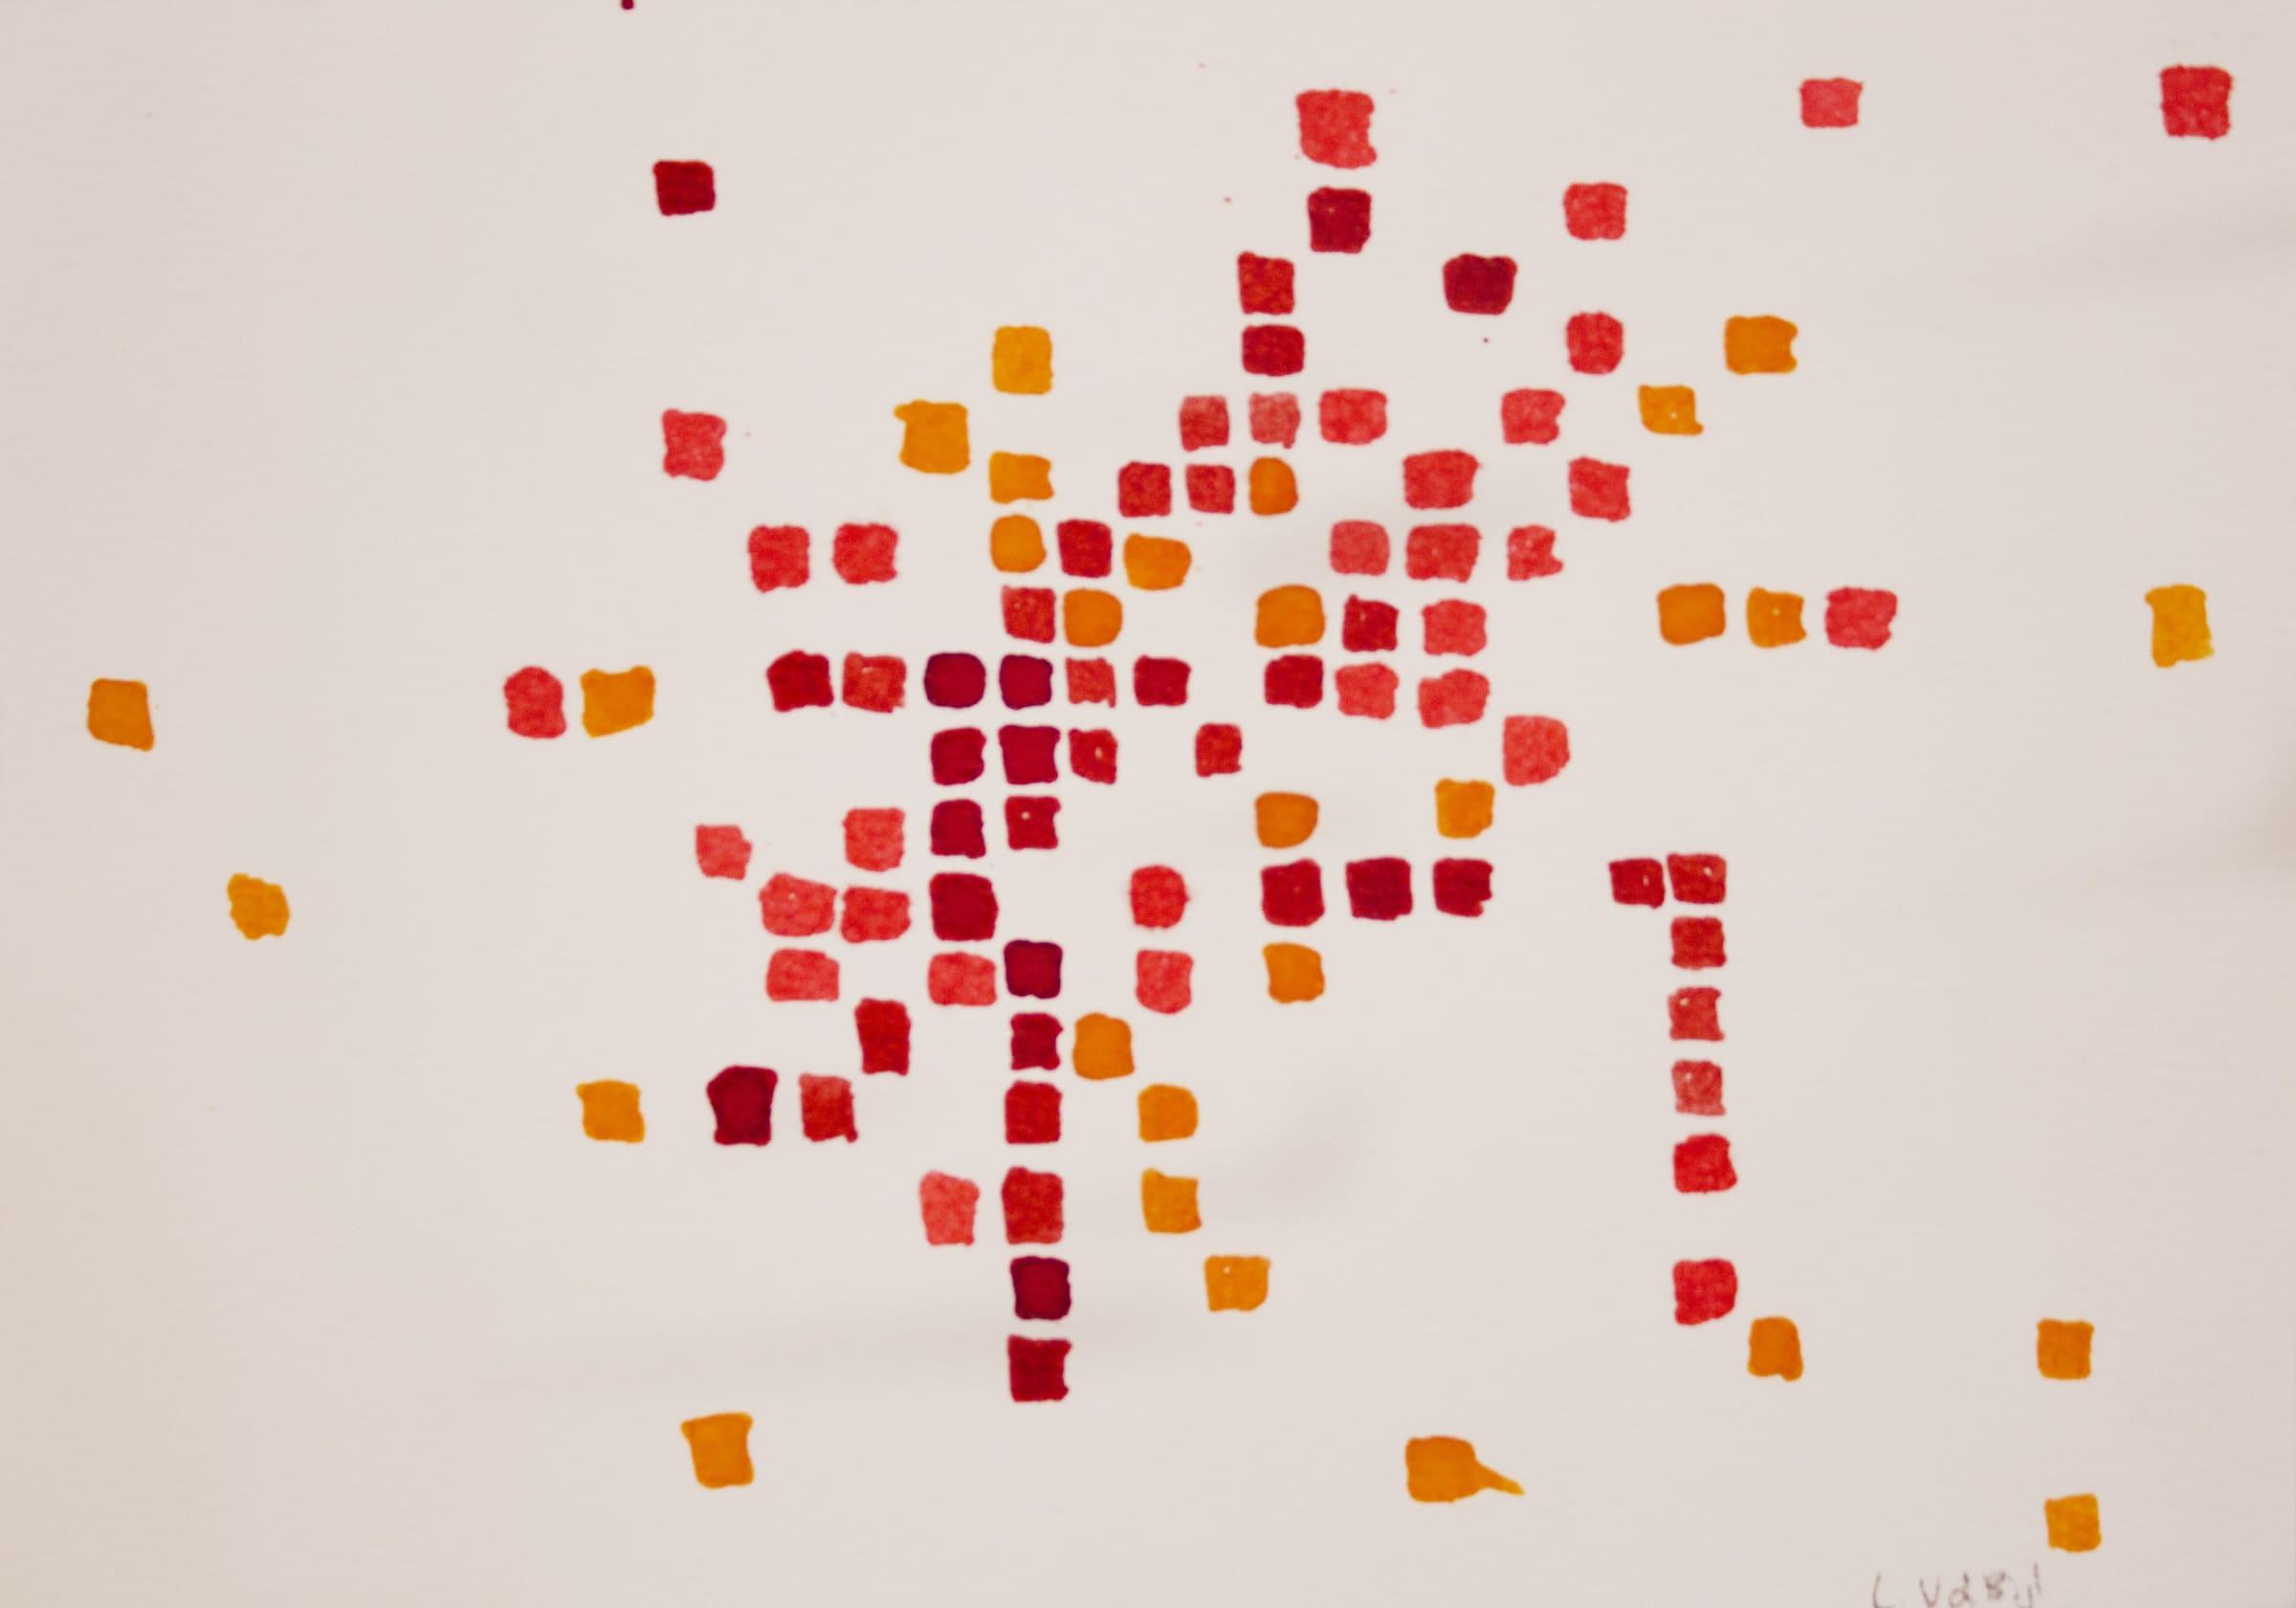 <span class=&#34;link fancybox-details-link&#34;><a href=&#34;/artists/88-louise-van-der-bijl/works/2283-louise-van-der-bijl-inktober-day-20-2018/&#34;>View Detail Page</a></span><div class=&#34;artist&#34;><strong>Louise Van Der Bijl</strong></div> <div class=&#34;title&#34;><em>Inktober Day 20</em>, 2018</div> <div class=&#34;medium&#34;>Ink On Paper</div> <div class=&#34;dimensions&#34;>15cm x 21cm</div><div class=&#34;price&#34;>R400.00</div>